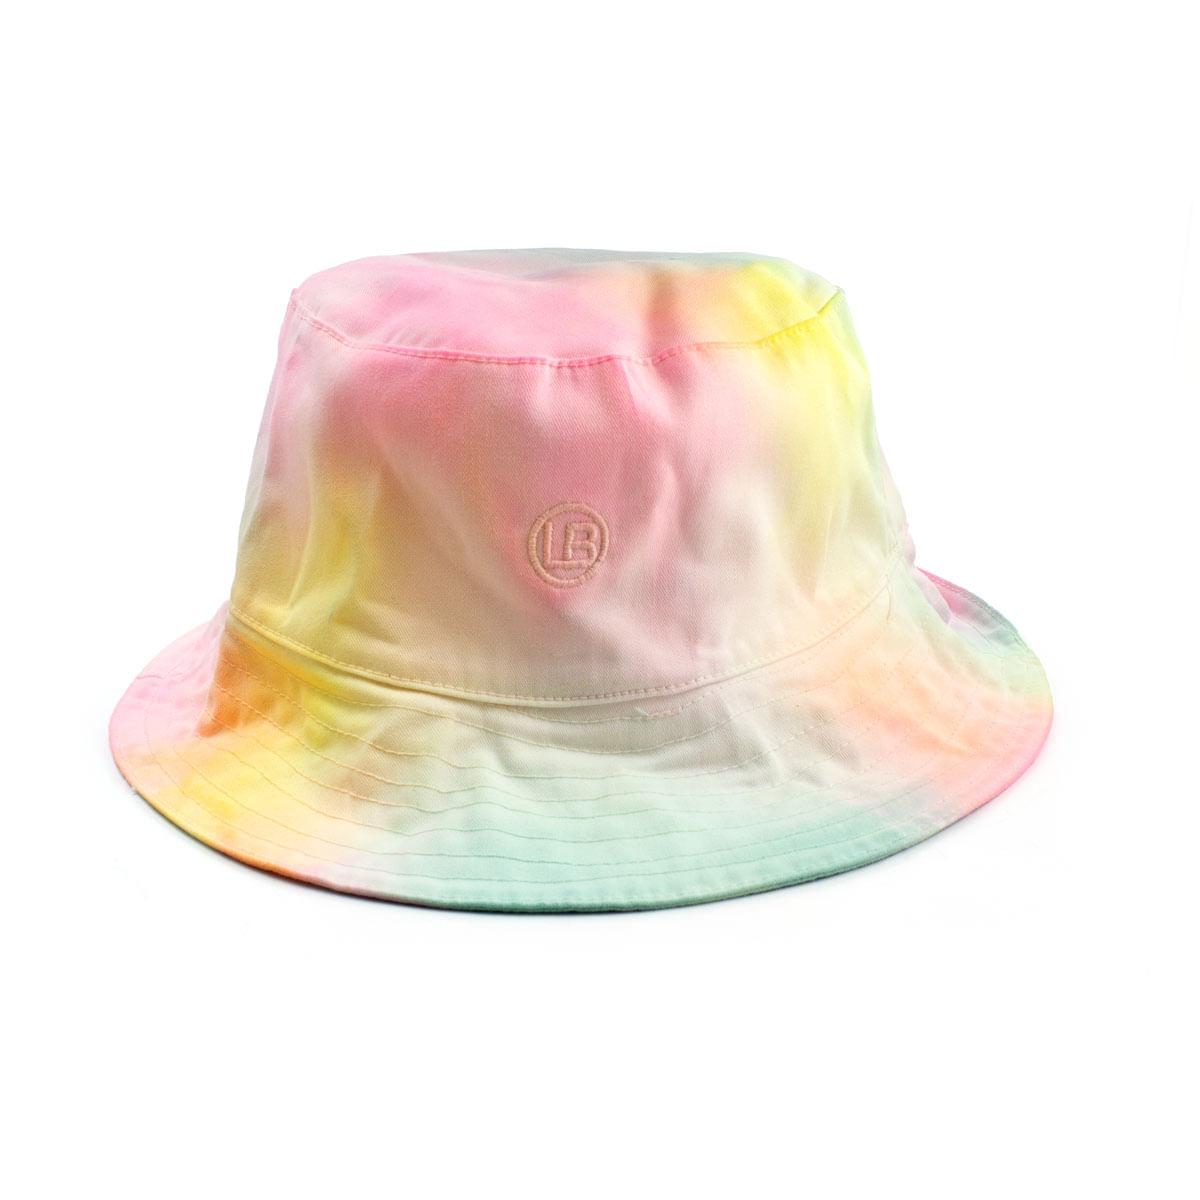 Chapeu-Bucket-Hat-Tie-Dye-Artesanal-Ludique-et-Badin-